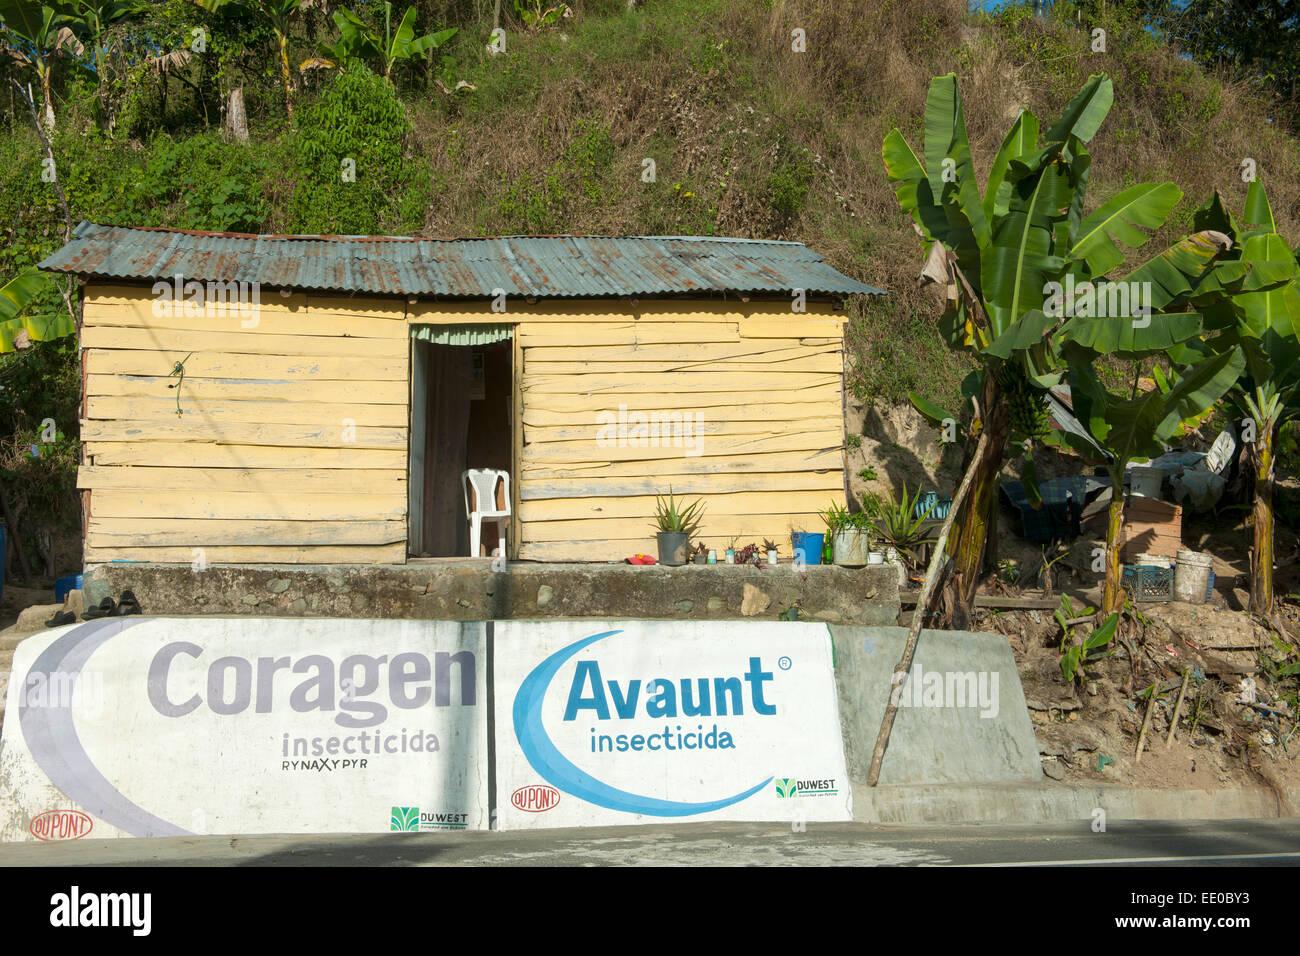 Dominikanische Republik, Cordillera Central, Constanza, Werbung für Herbizide und Pestizide - Stock Image